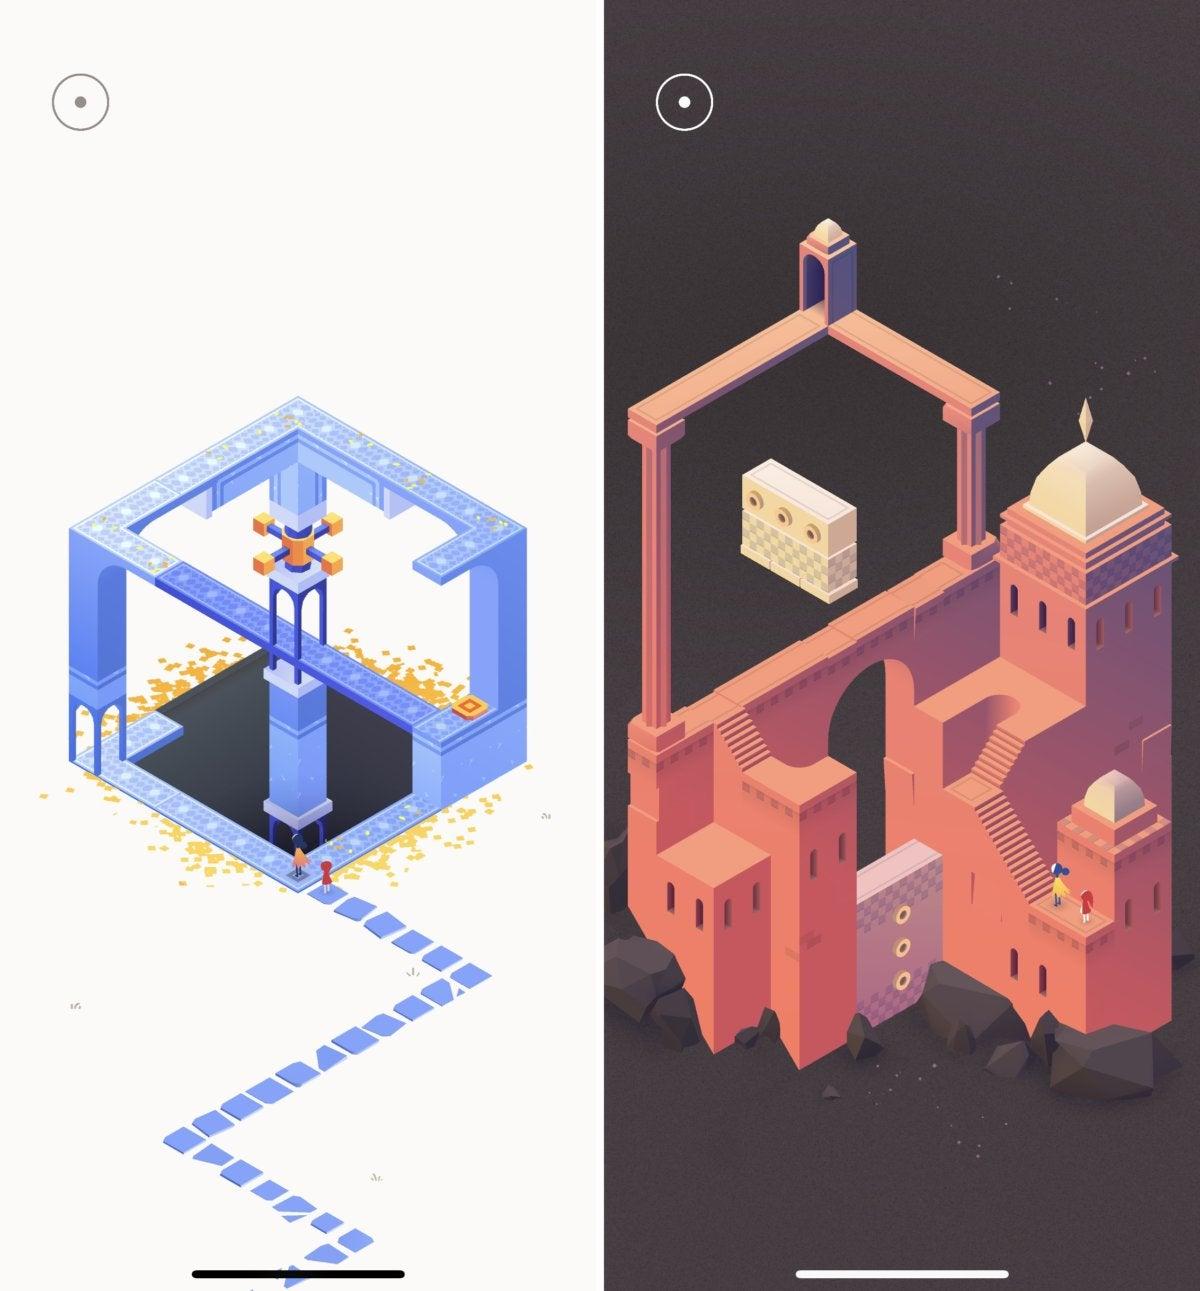 iphonex games monvalley2